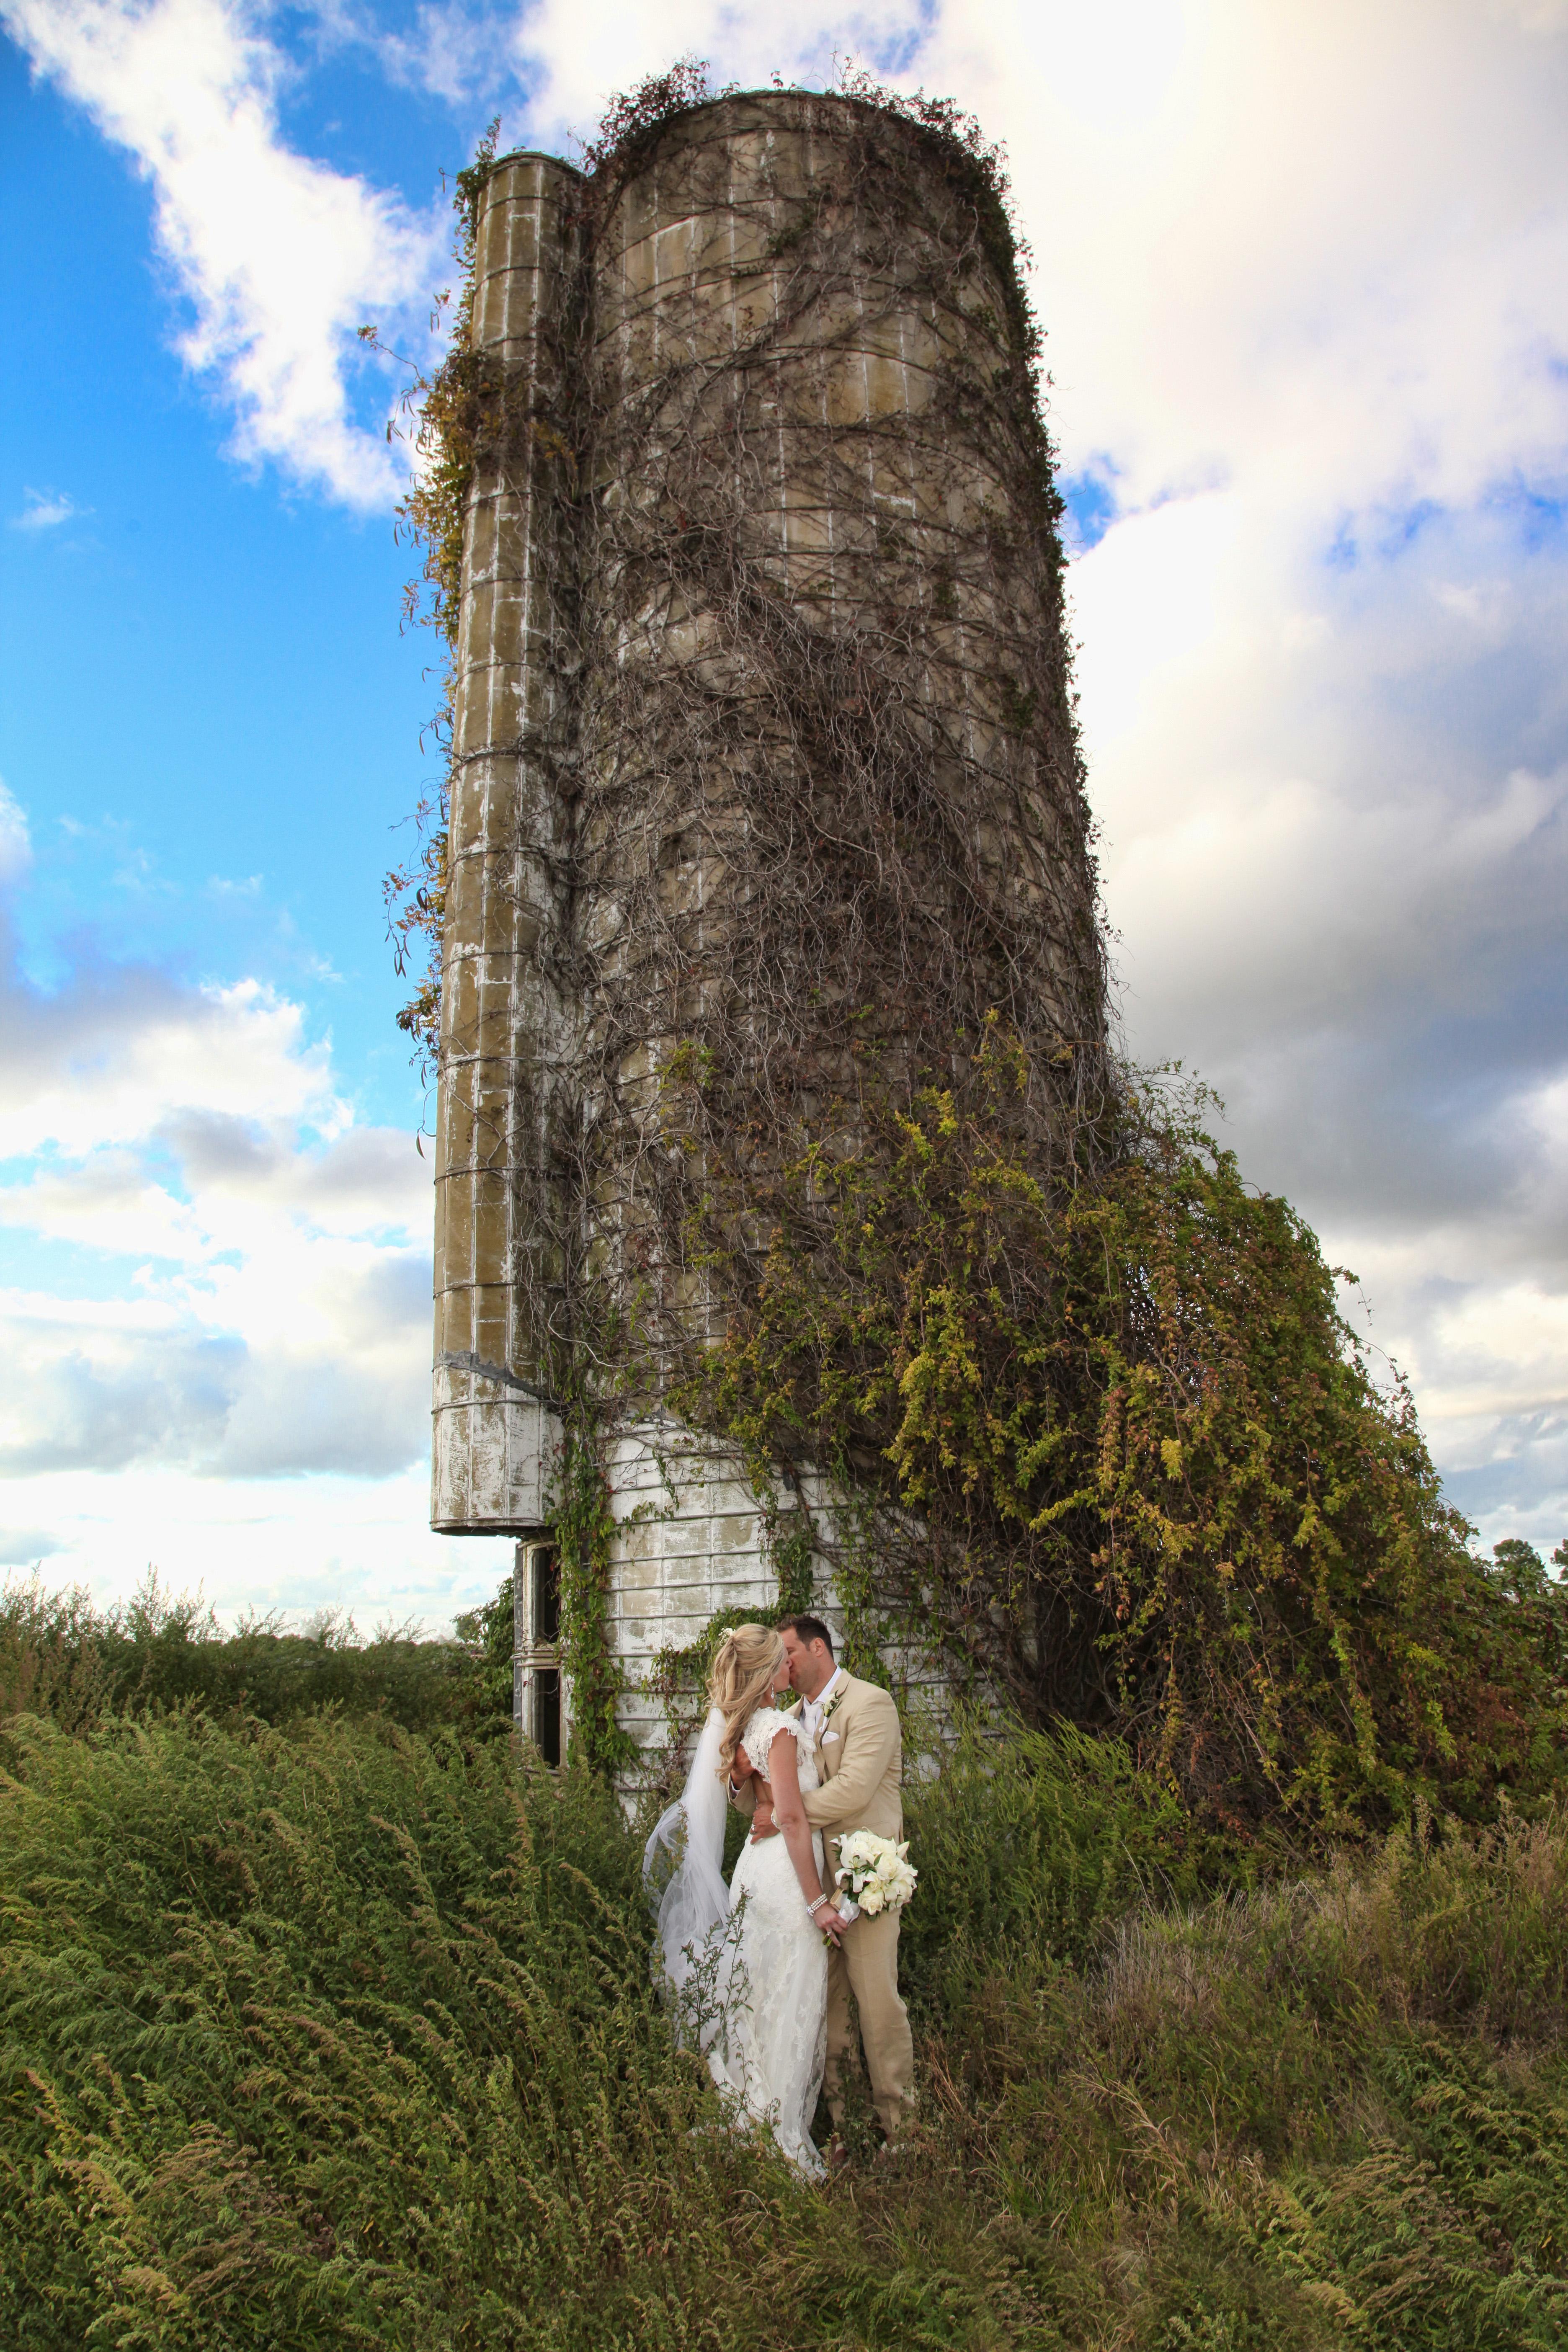 545 415 857 65962101529836439772033762393407325270542n: Lighthouse Sound Wedding Venue At Websimilar.org